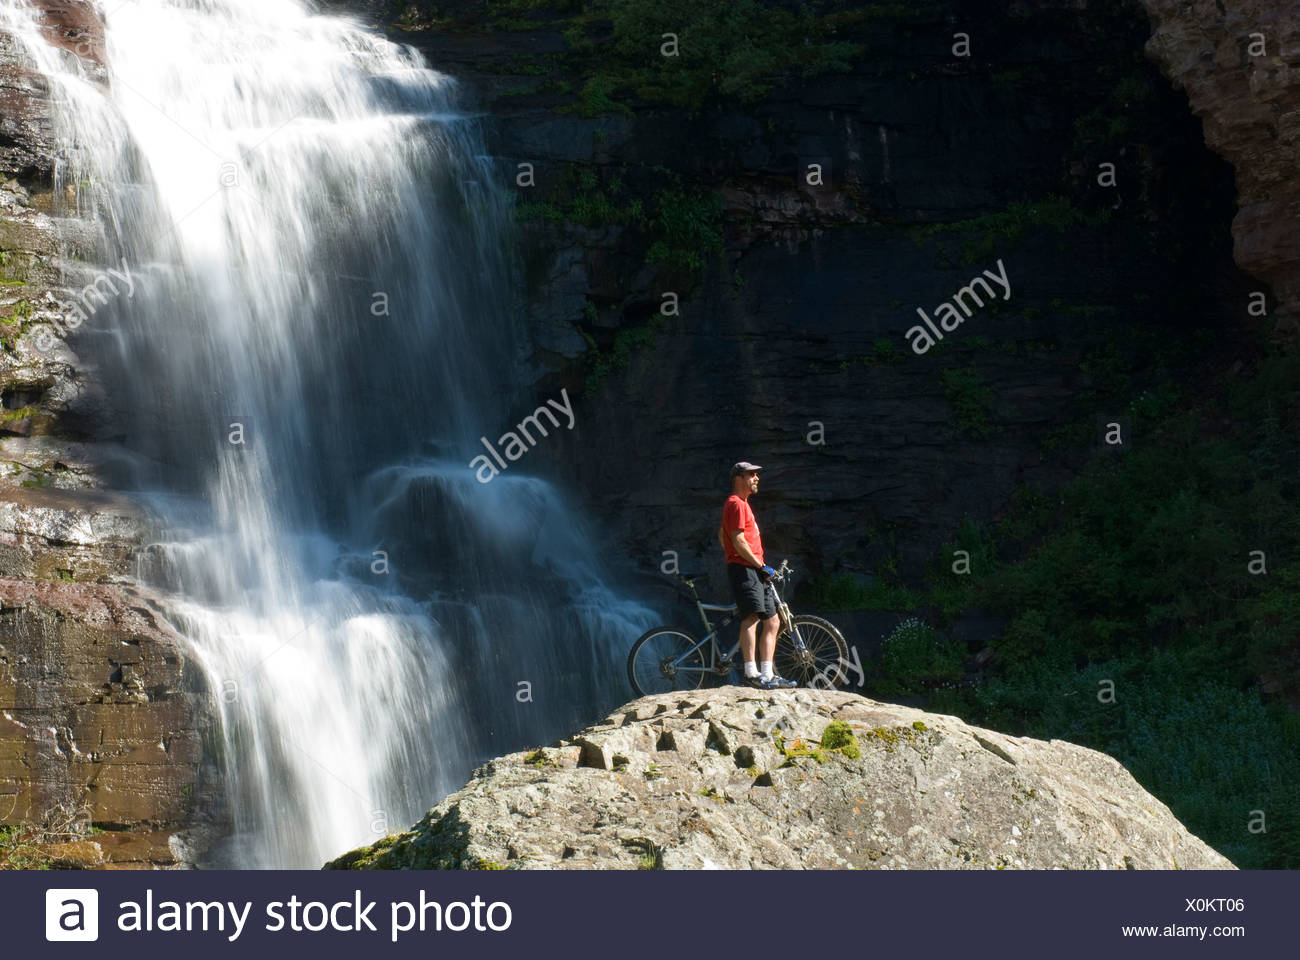 Man and mountain bike on rock, Bear Creek Falls, Telluride, Colorado. - Stock Image